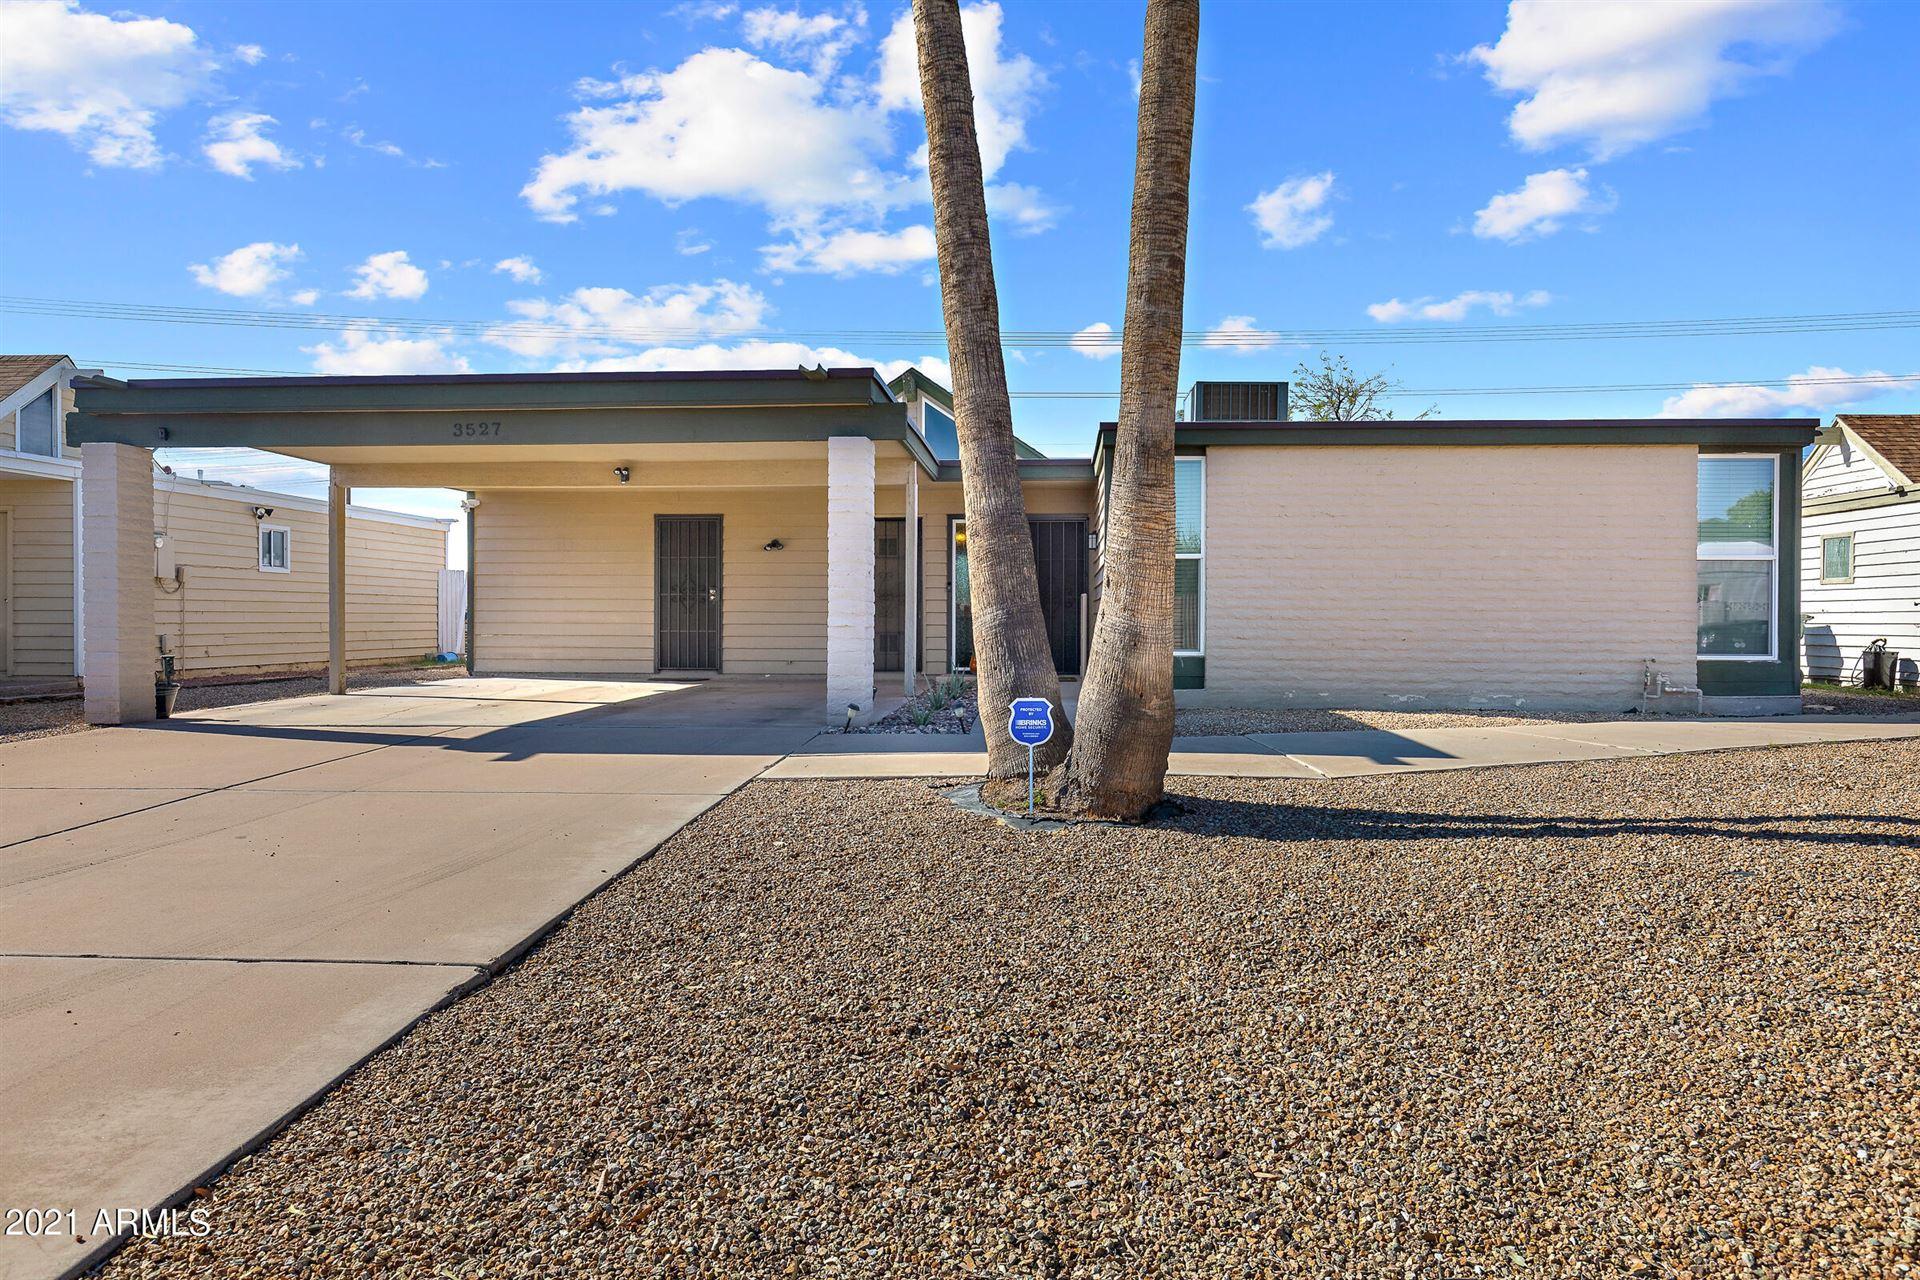 Photo of 3527 W VOGEL Avenue, Phoenix, AZ 85051 (MLS # 6307399)